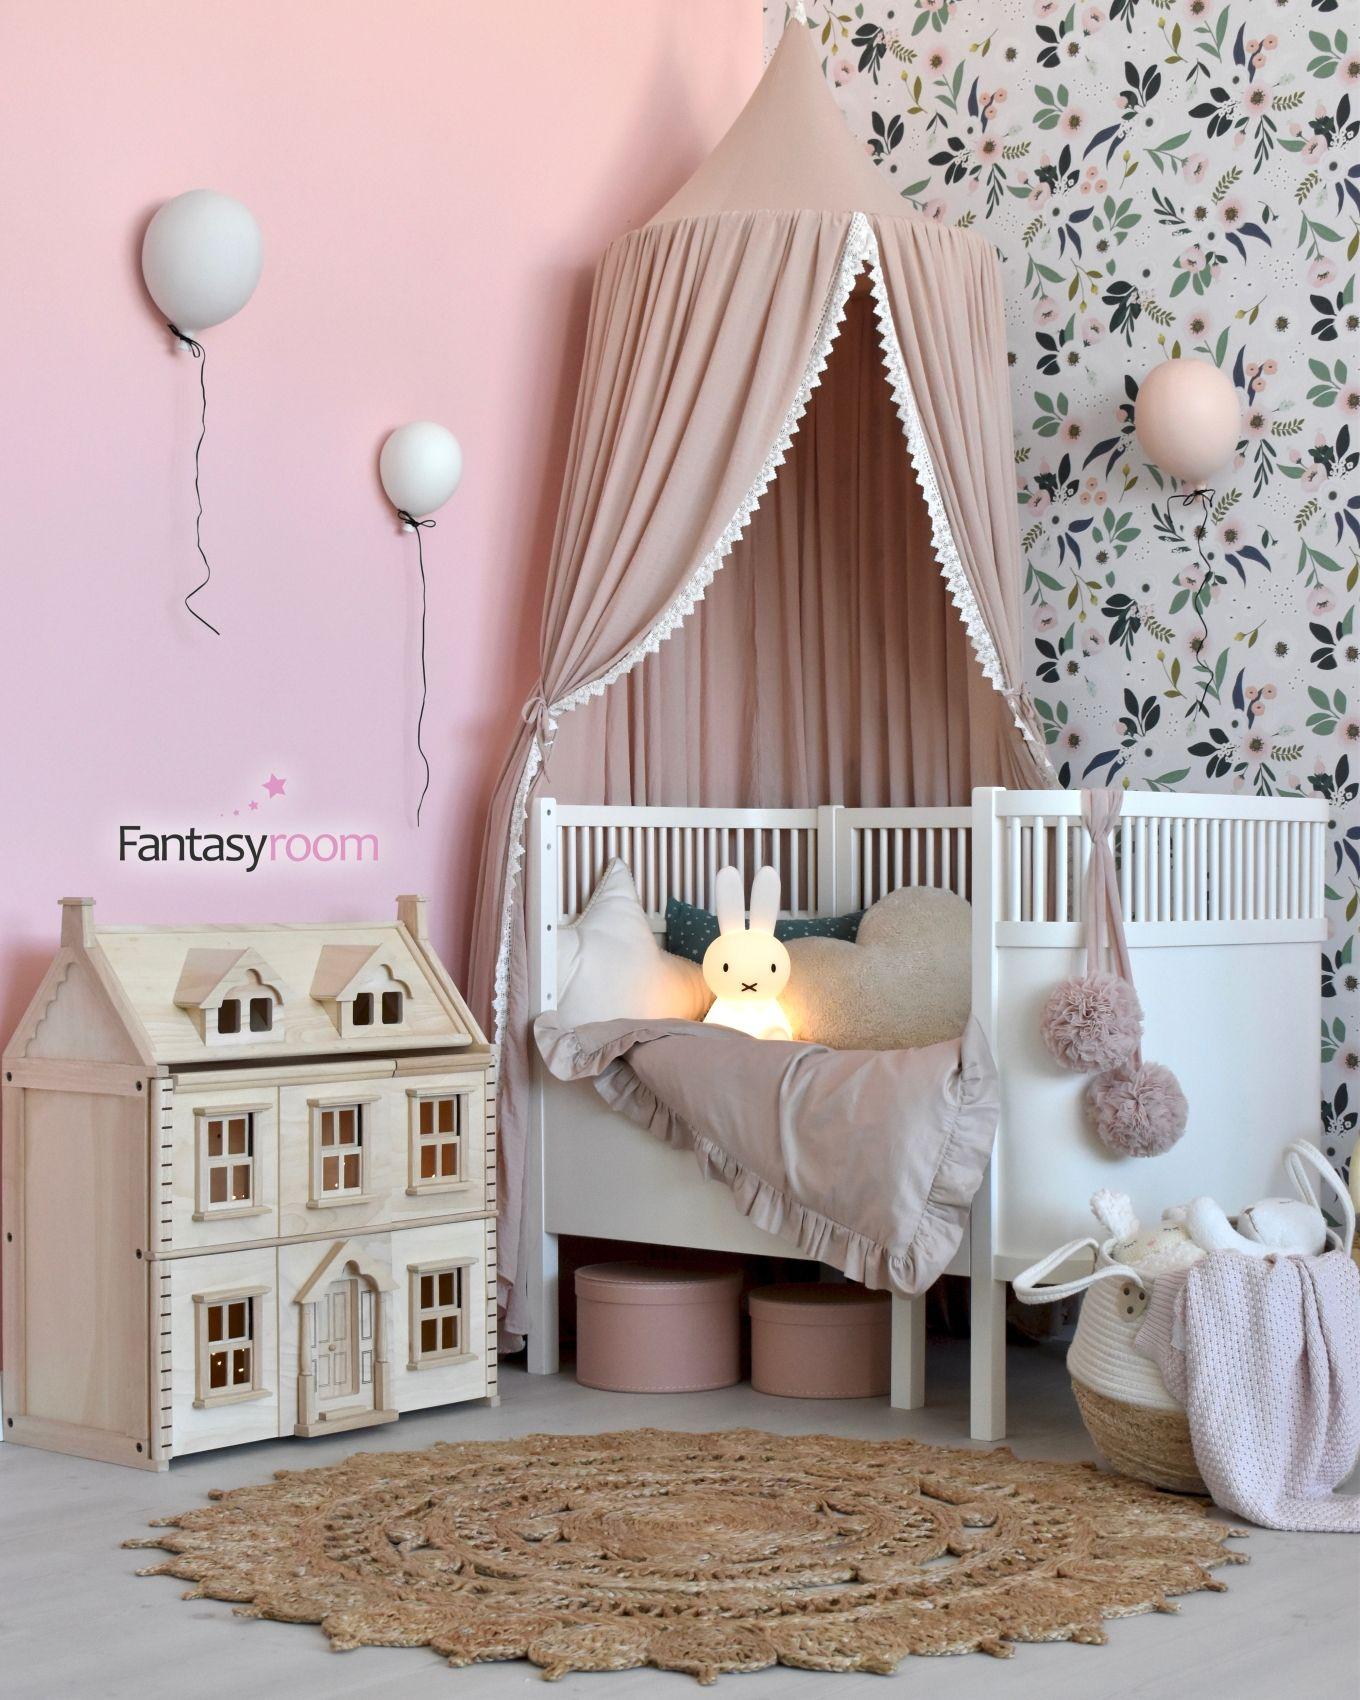 keramik luftballons 3d wanddeko fur dein kinderzimmer kinder zimmer goldene wanddekoration deko wand wohnzimmer